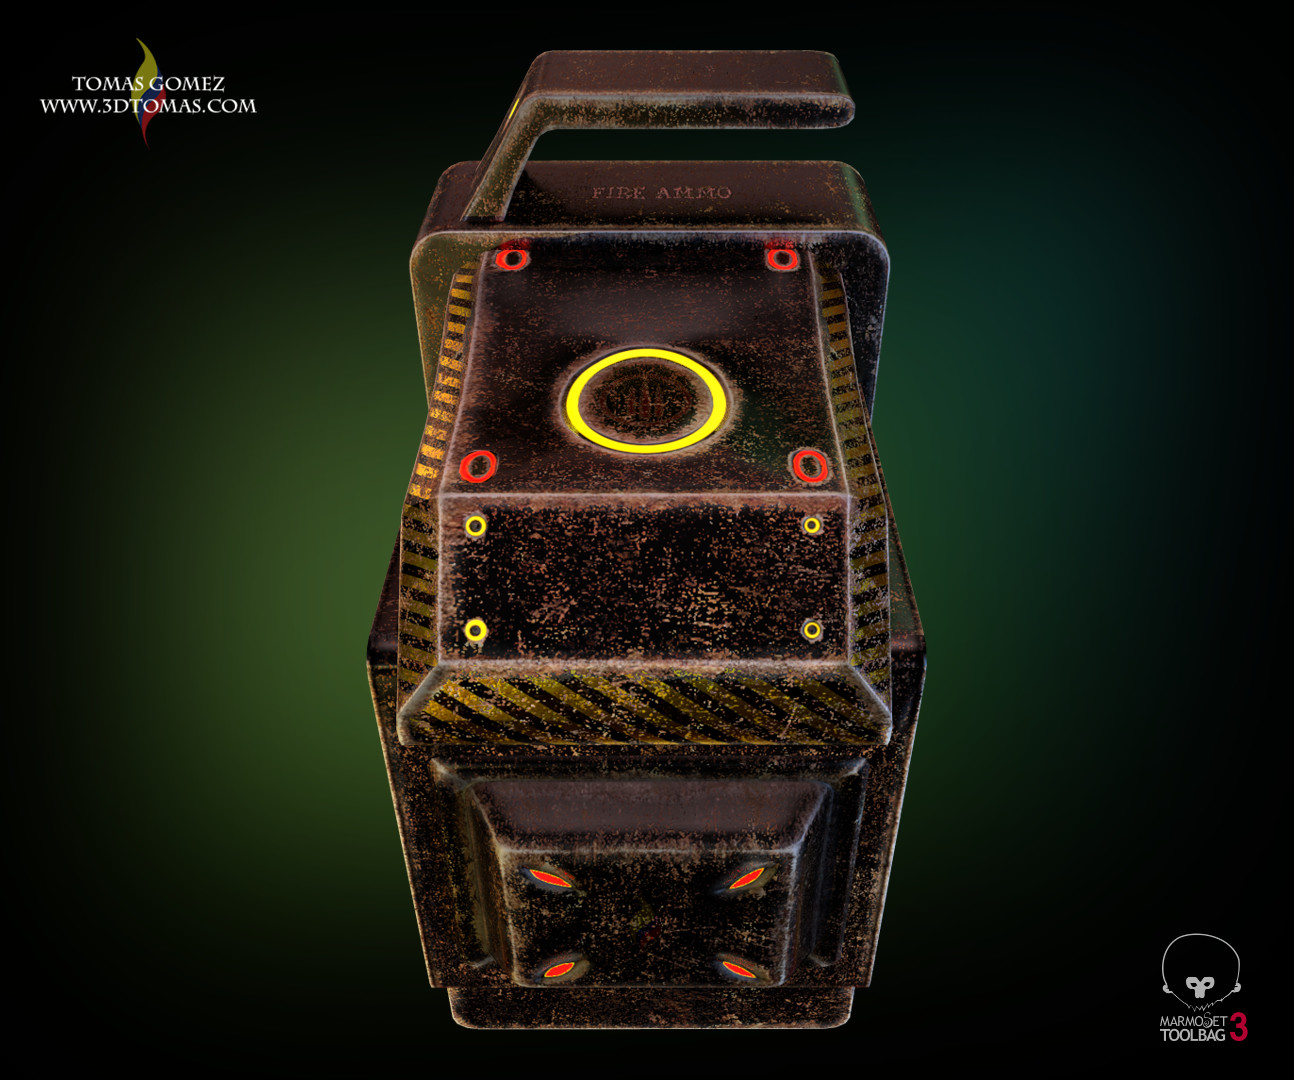 Tomas gomez crate5